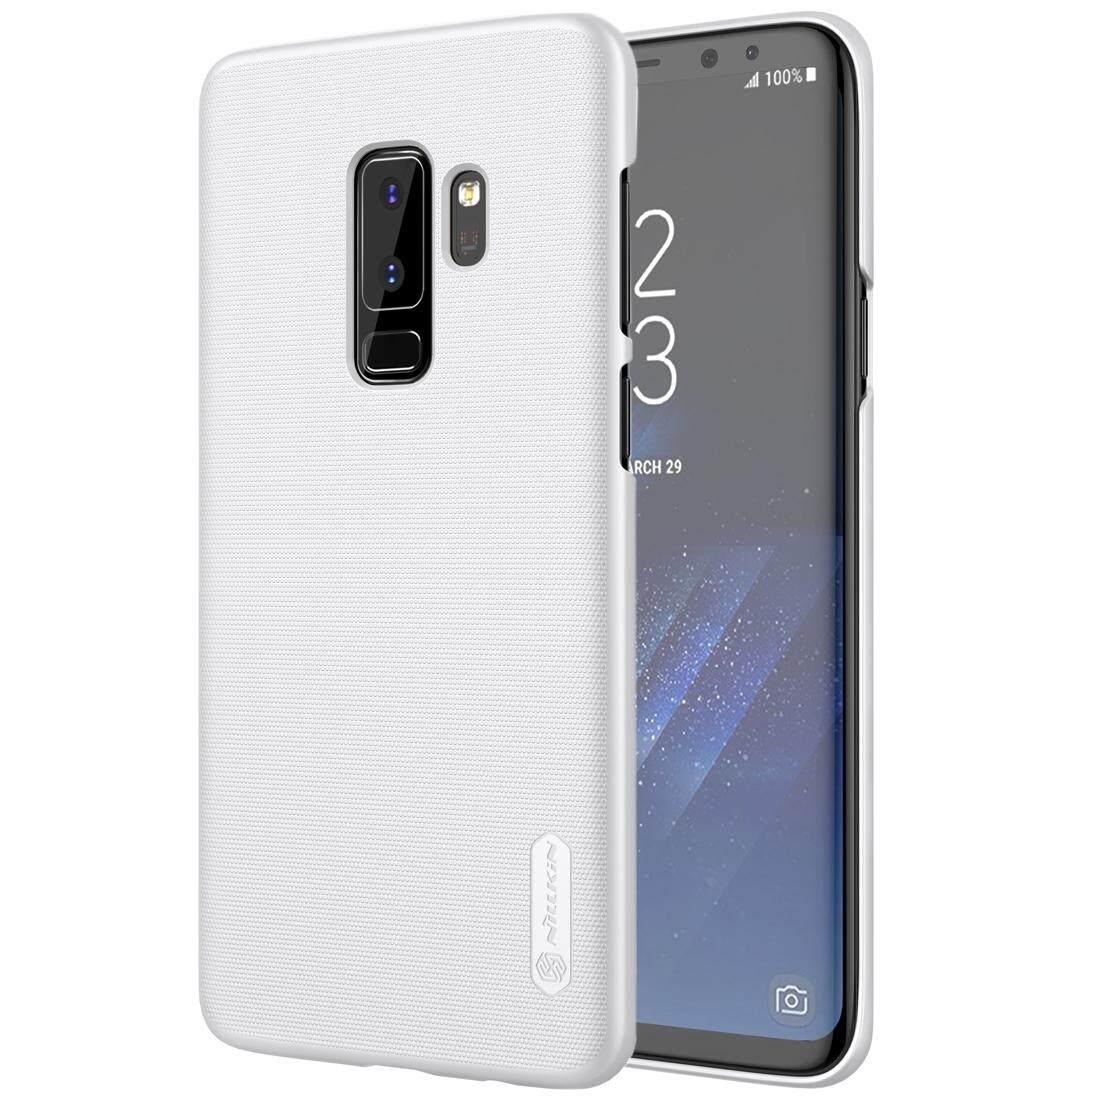 NILLKIN untuk Samsung Galaksi S9 + Tekstur Cembung Cekung Buah Pelindung Belakang Case (Putih)-Internasional